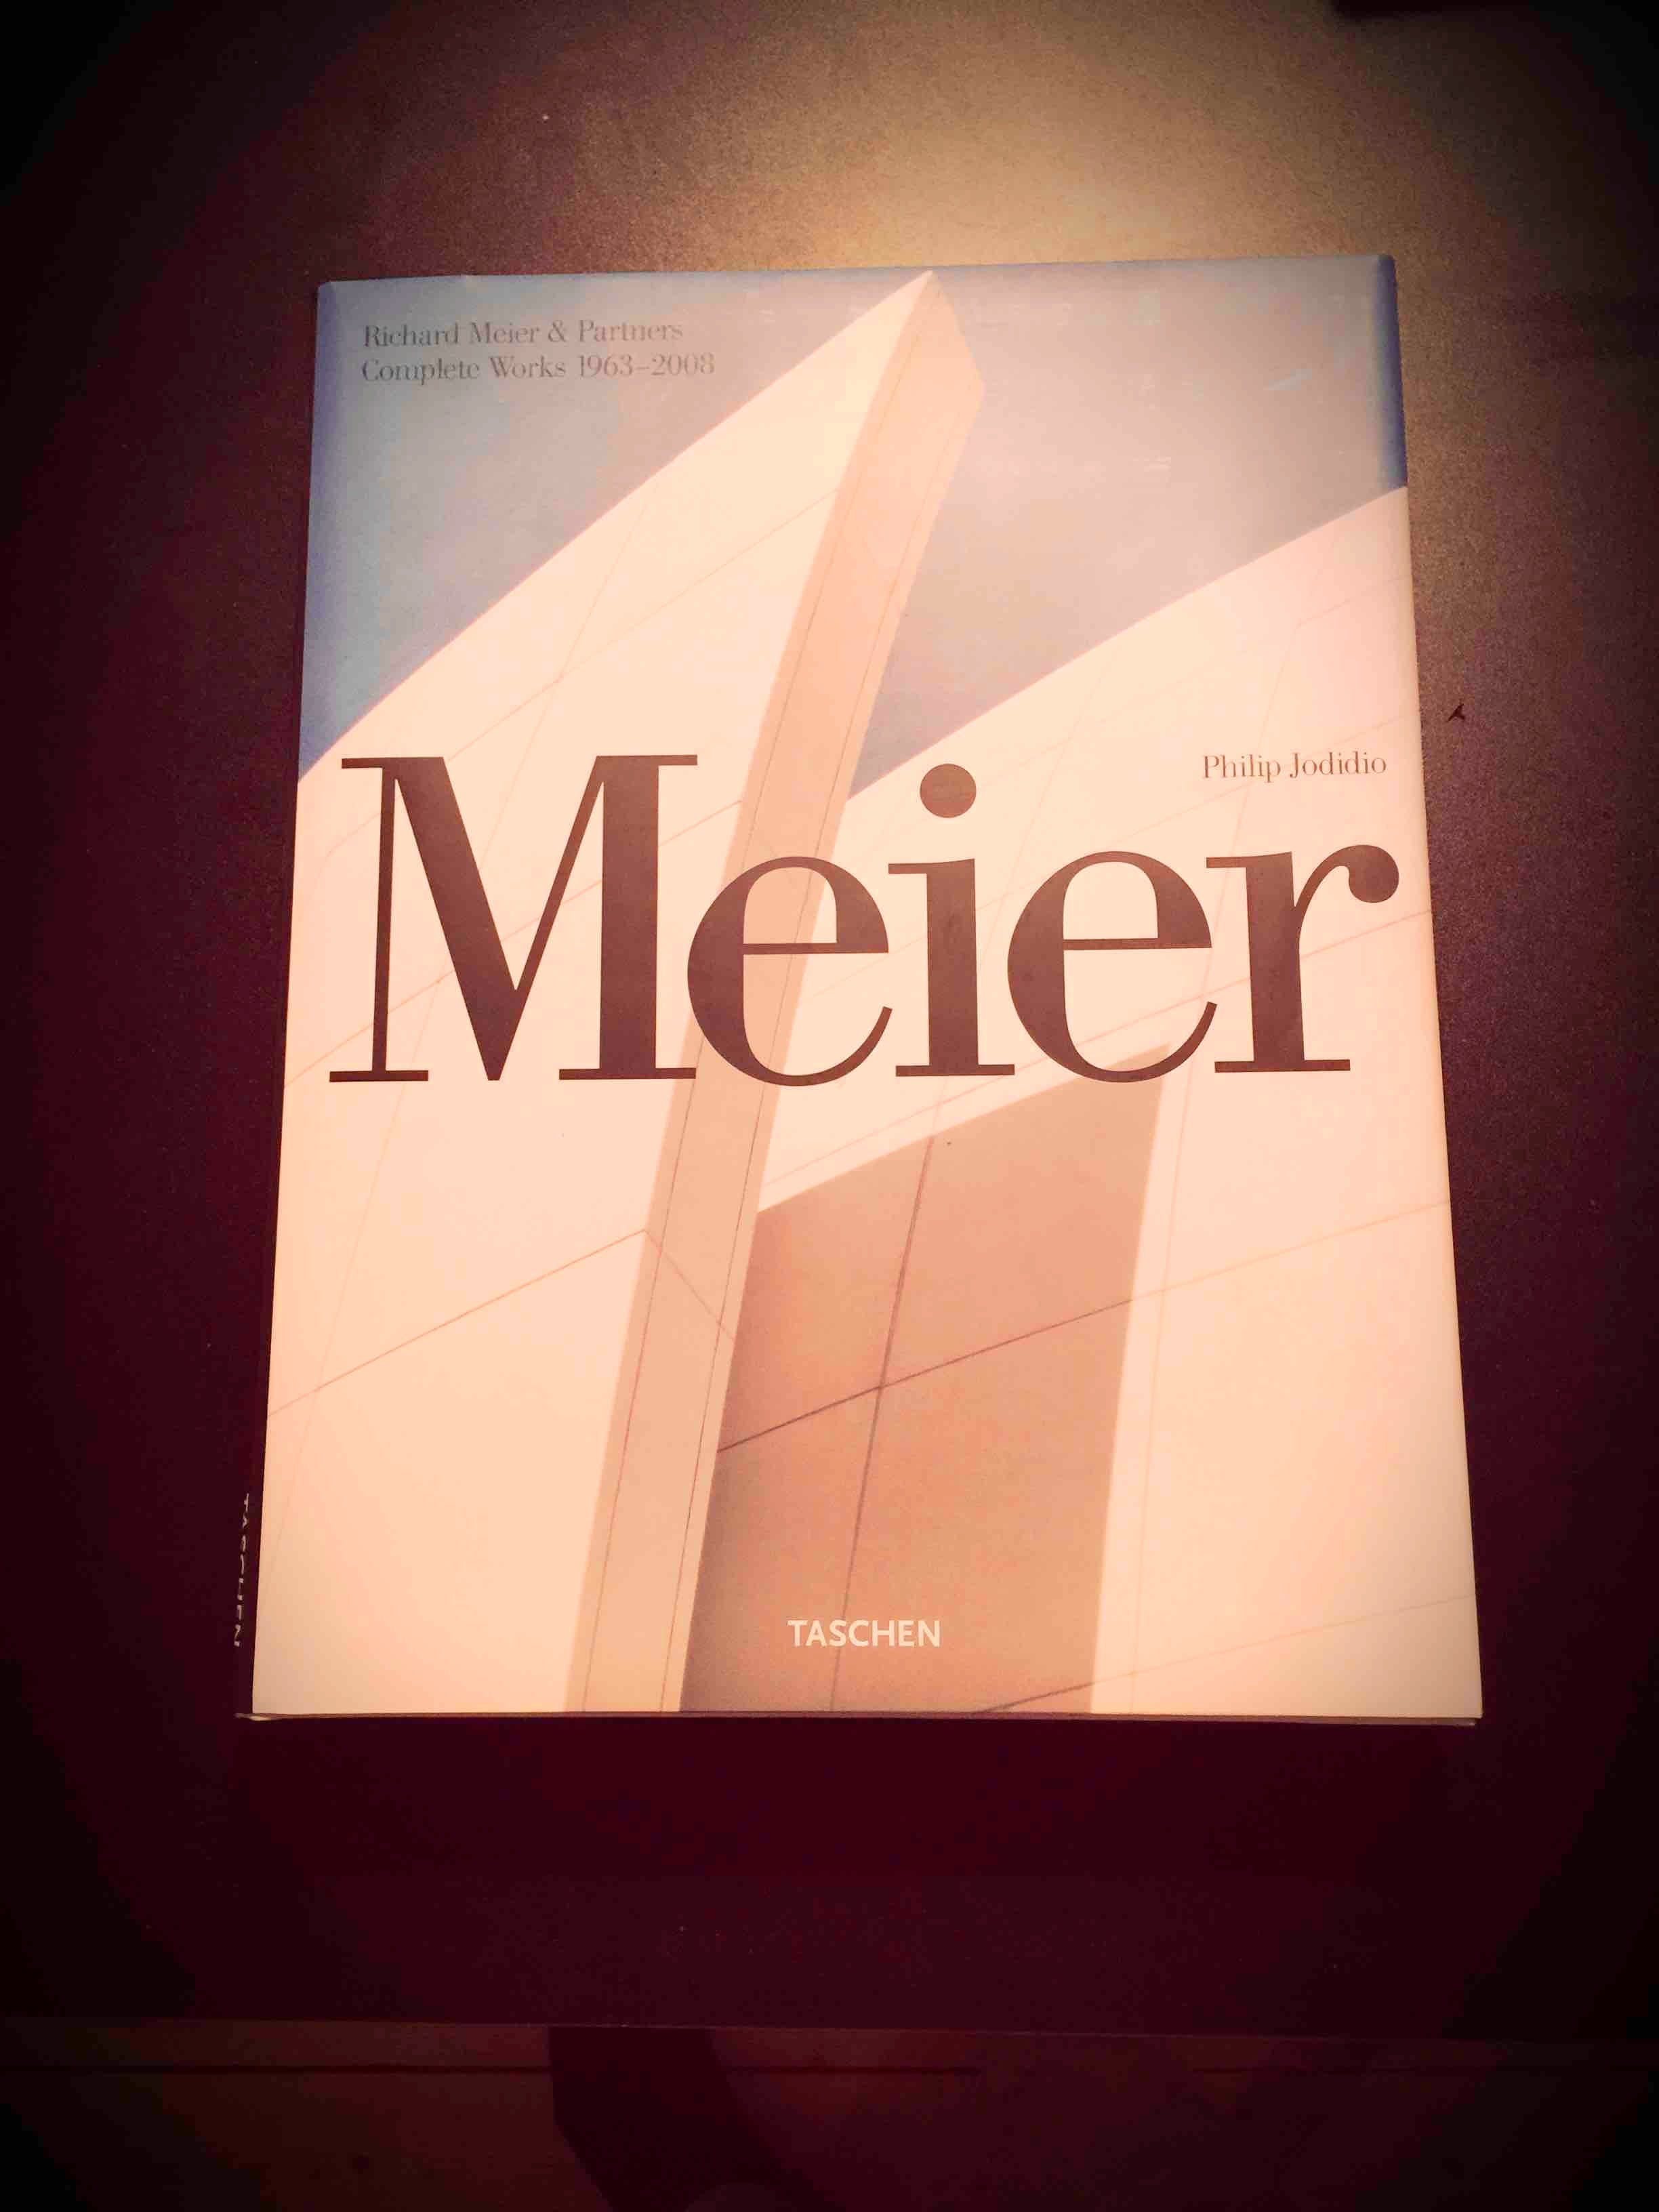 Richard Meier - Complete Works